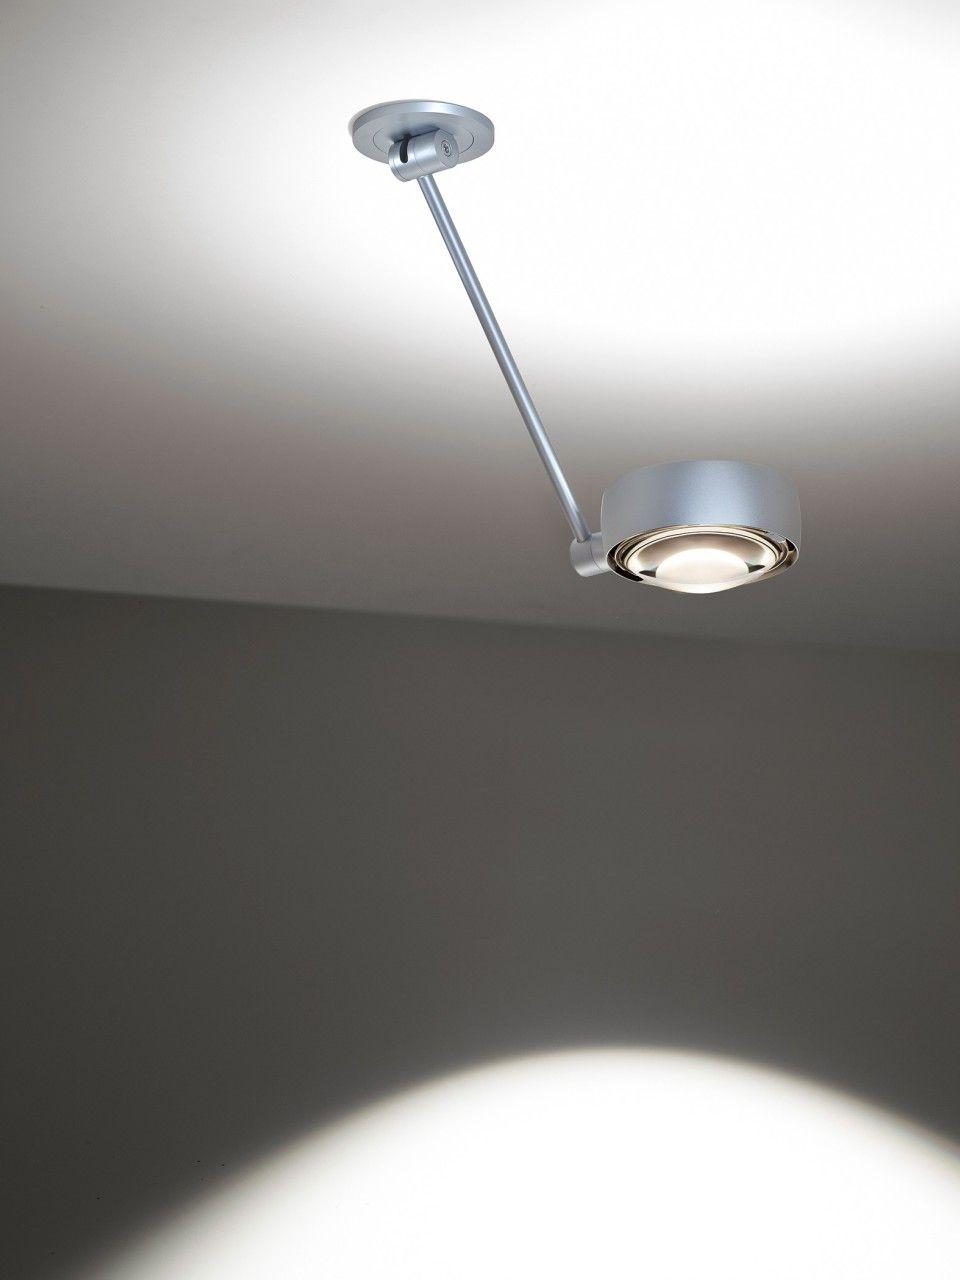 Produkte | Occhio laluce Licht&Design Chur | Occhio Lights ...